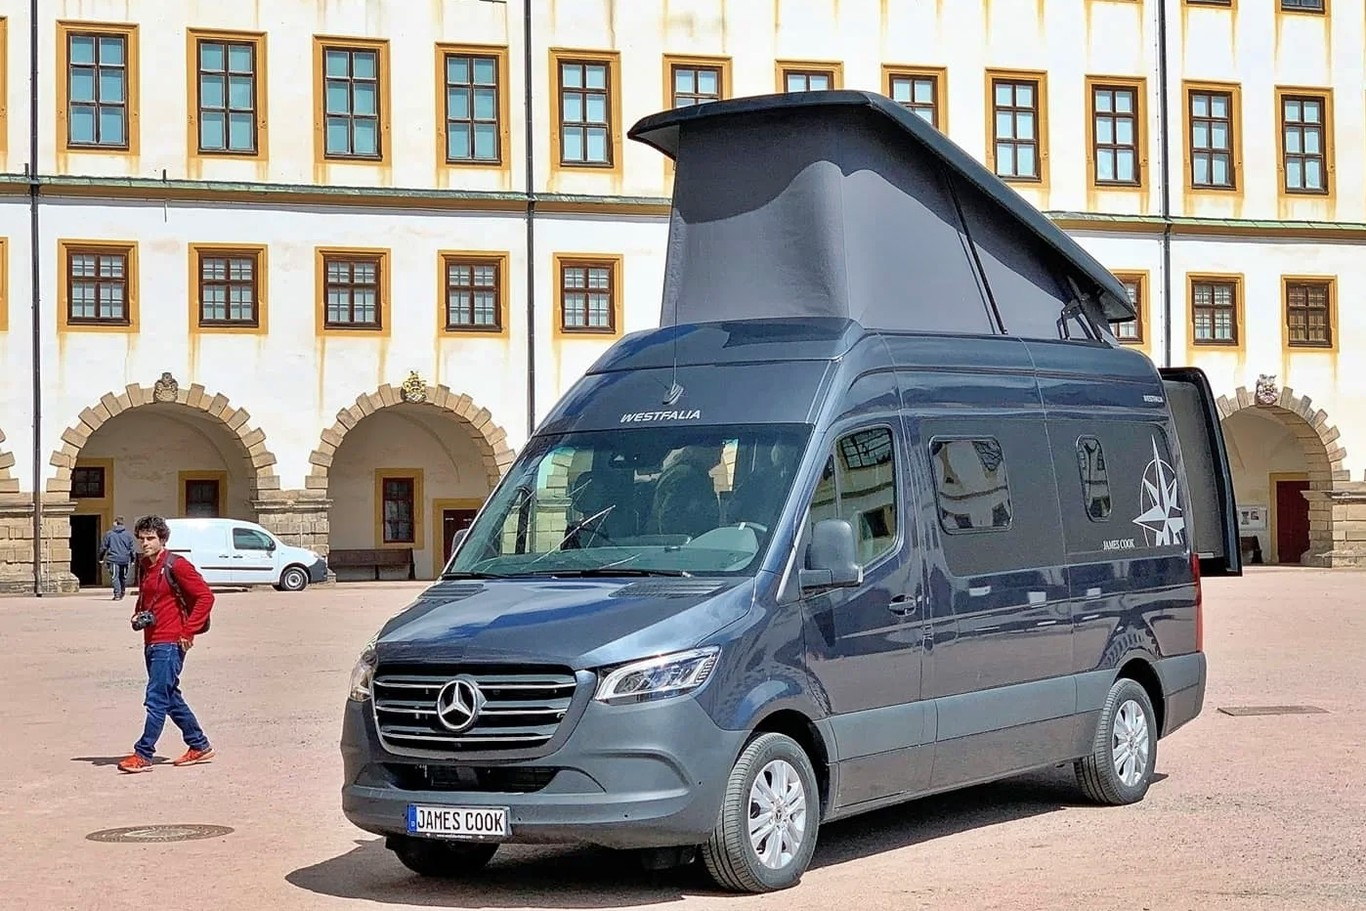 La Mercedes-Benz Sprinter James Cook es el antídoto camper de Westfalia contra la Grand California